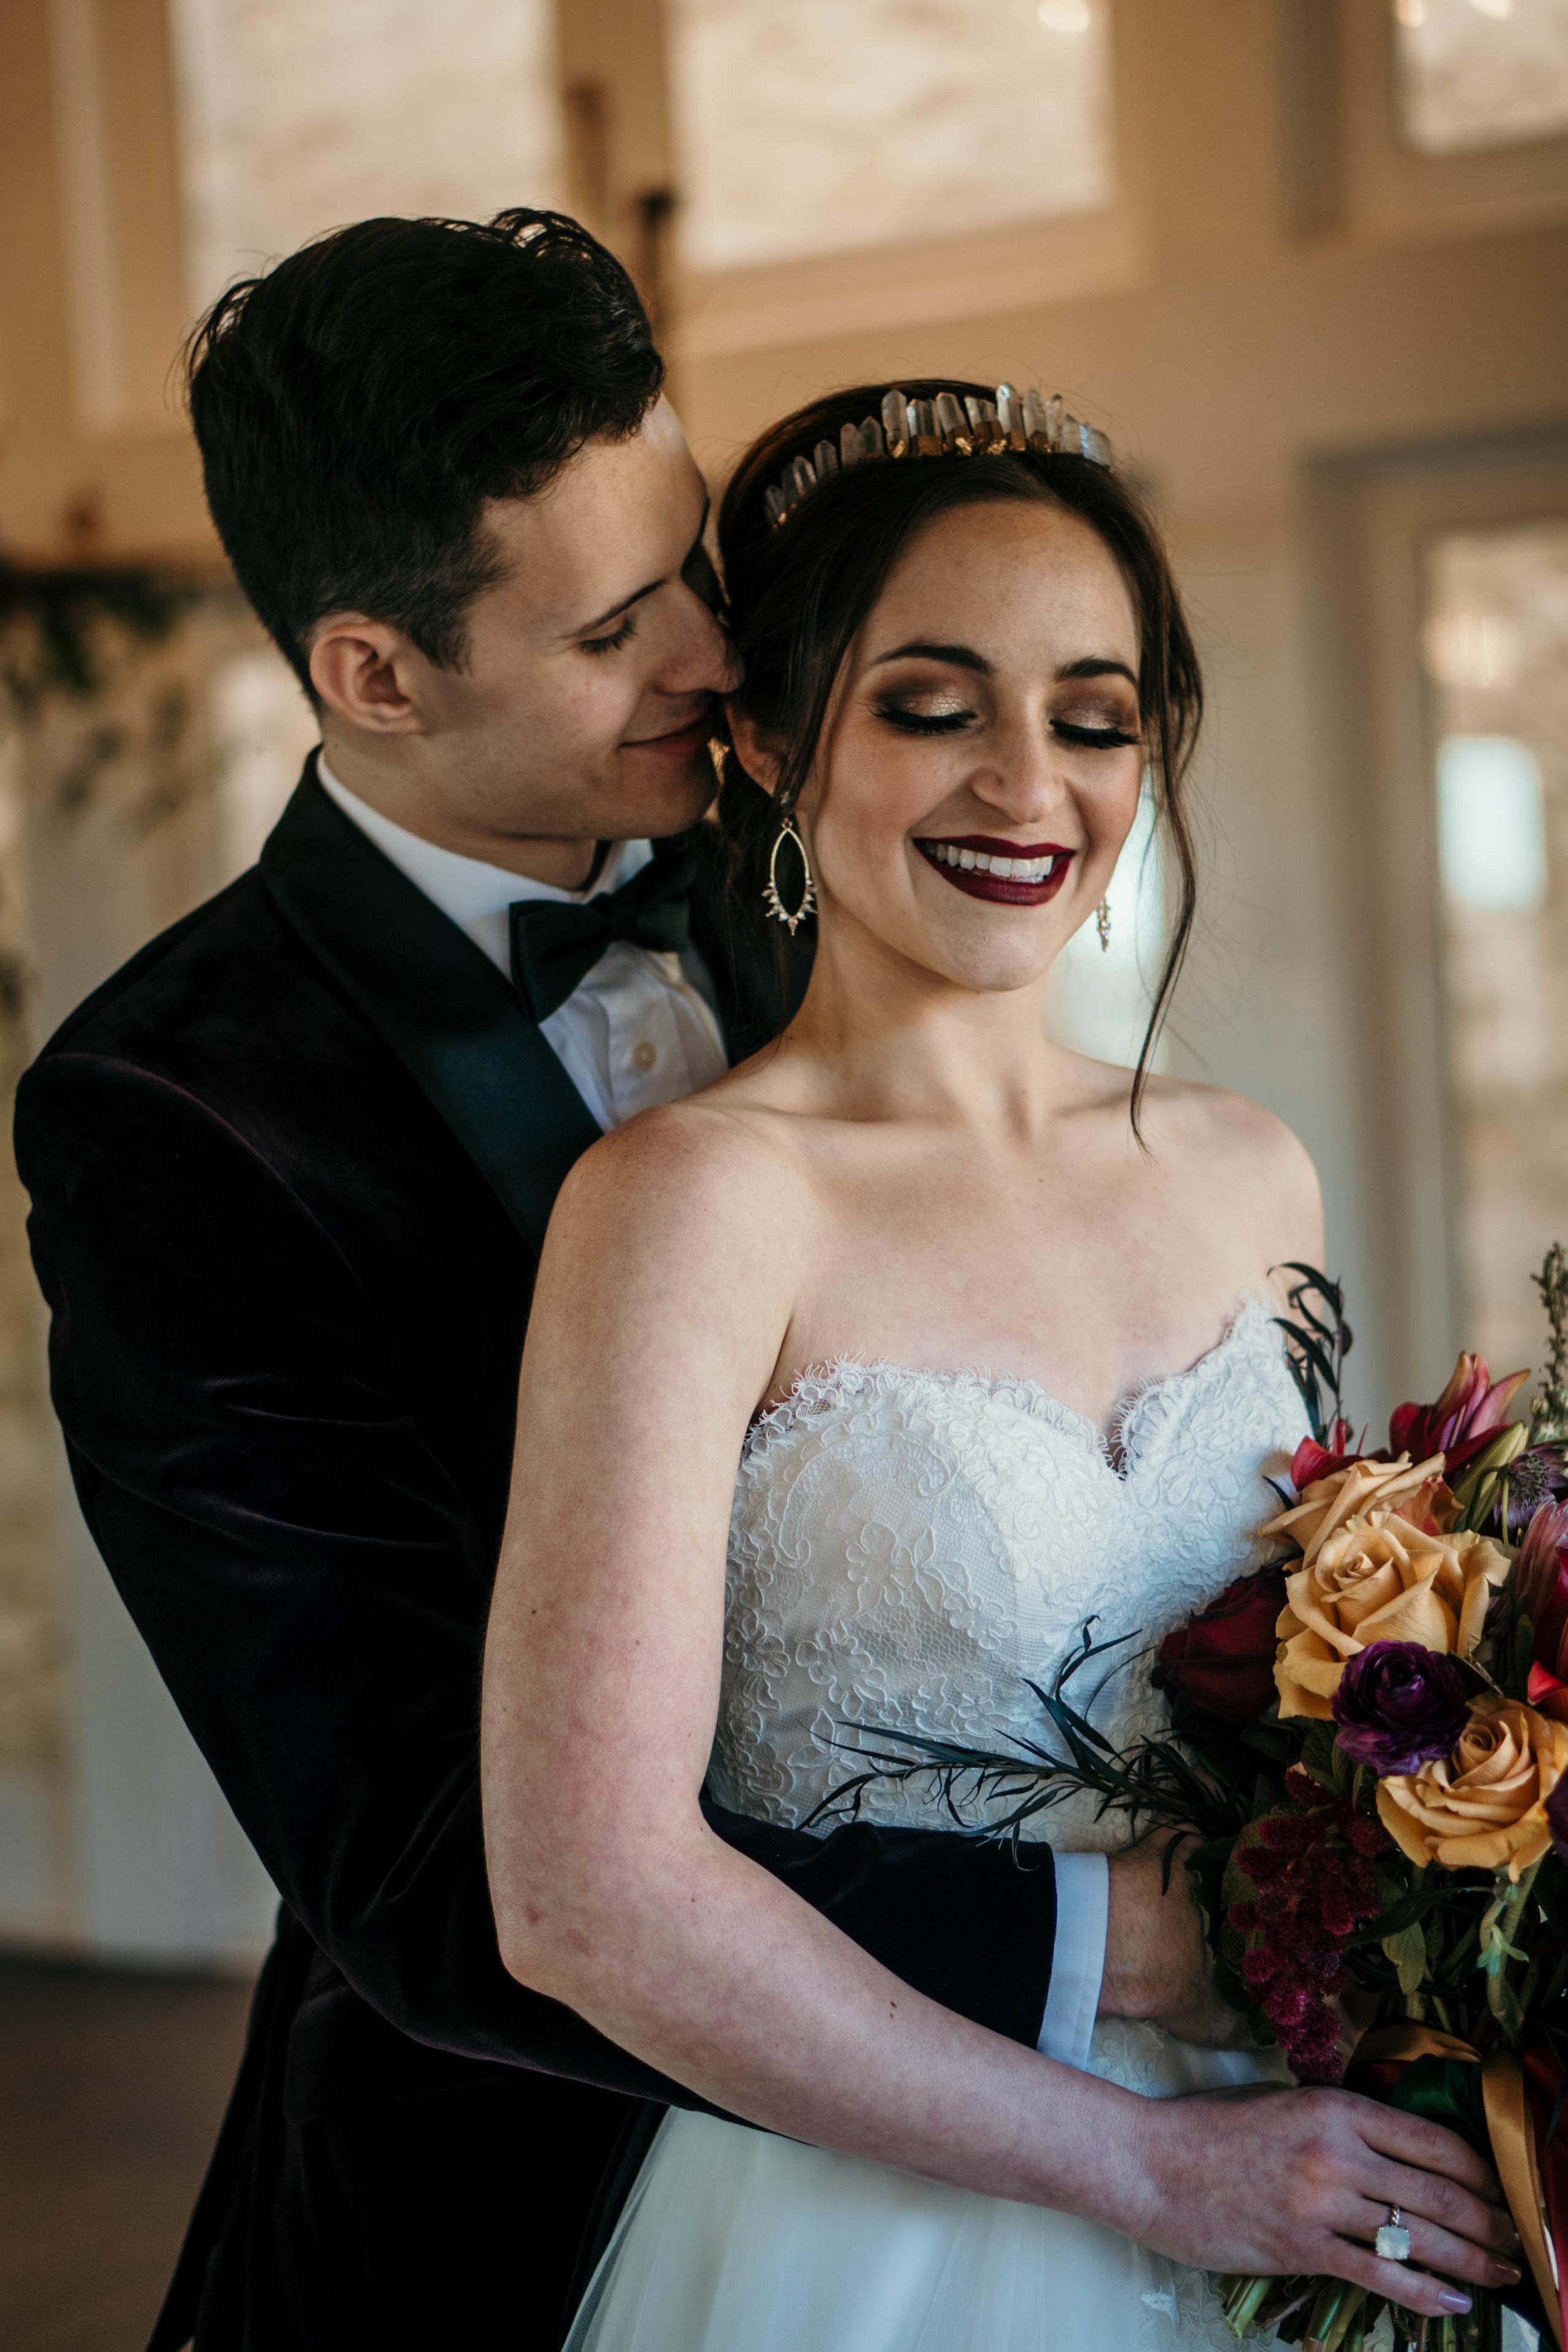 Austin Wedding Videographer - Dolls for Dolls (323 of 323).jpg